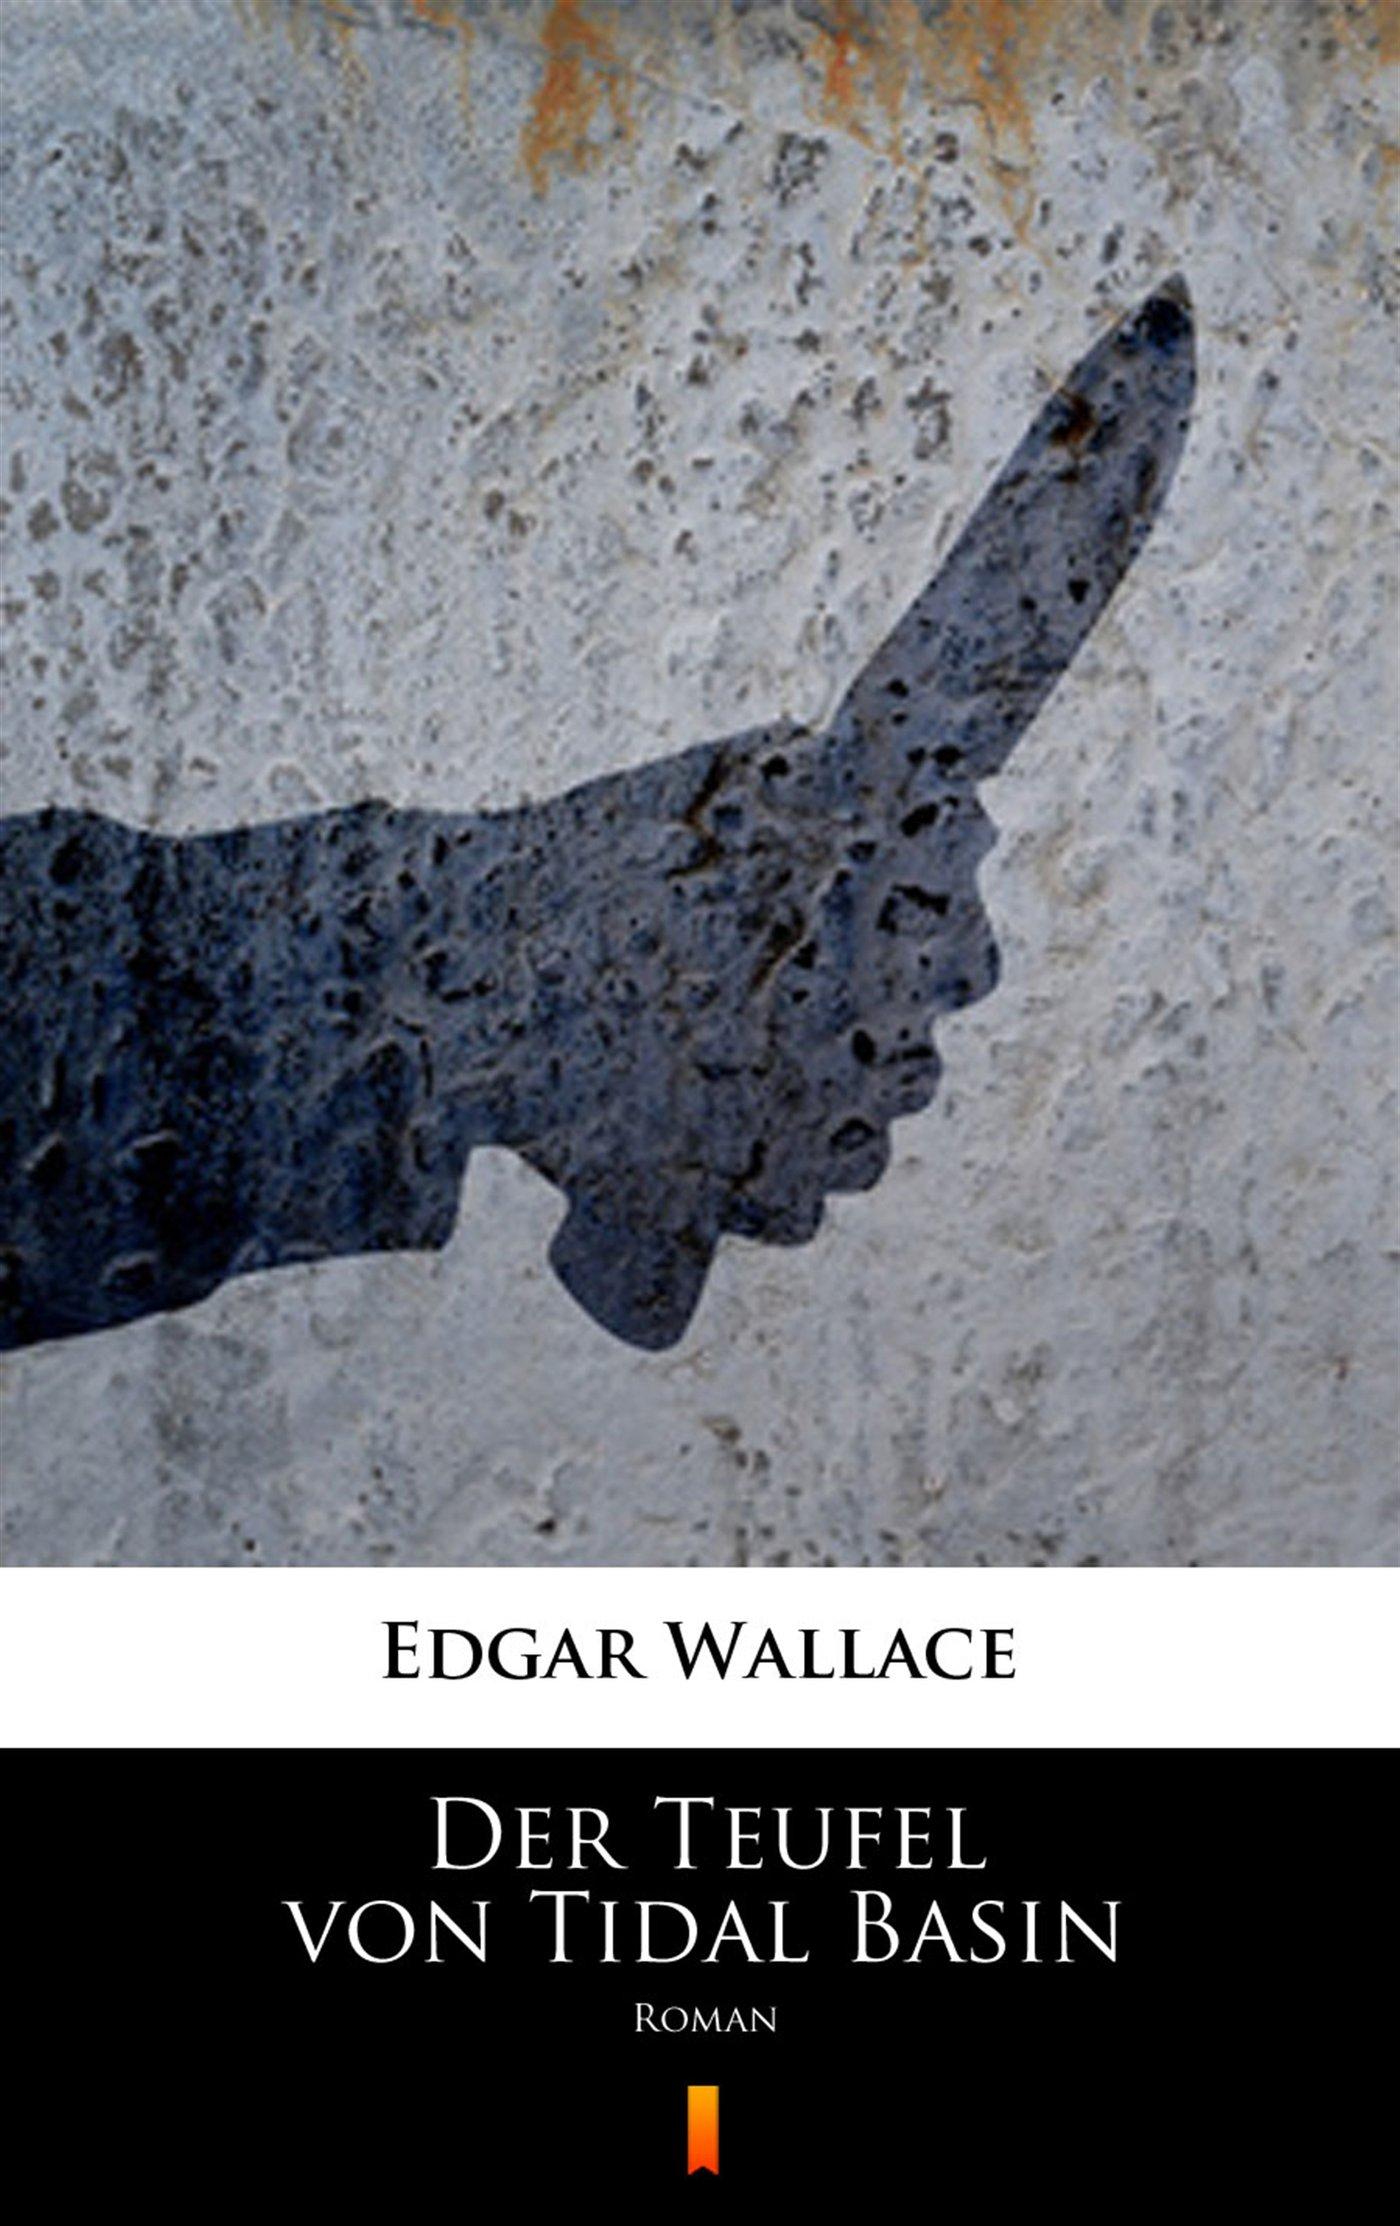 Der Teufel von Tidal Basin - Ebook (Książka EPUB) do pobrania w formacie EPUB